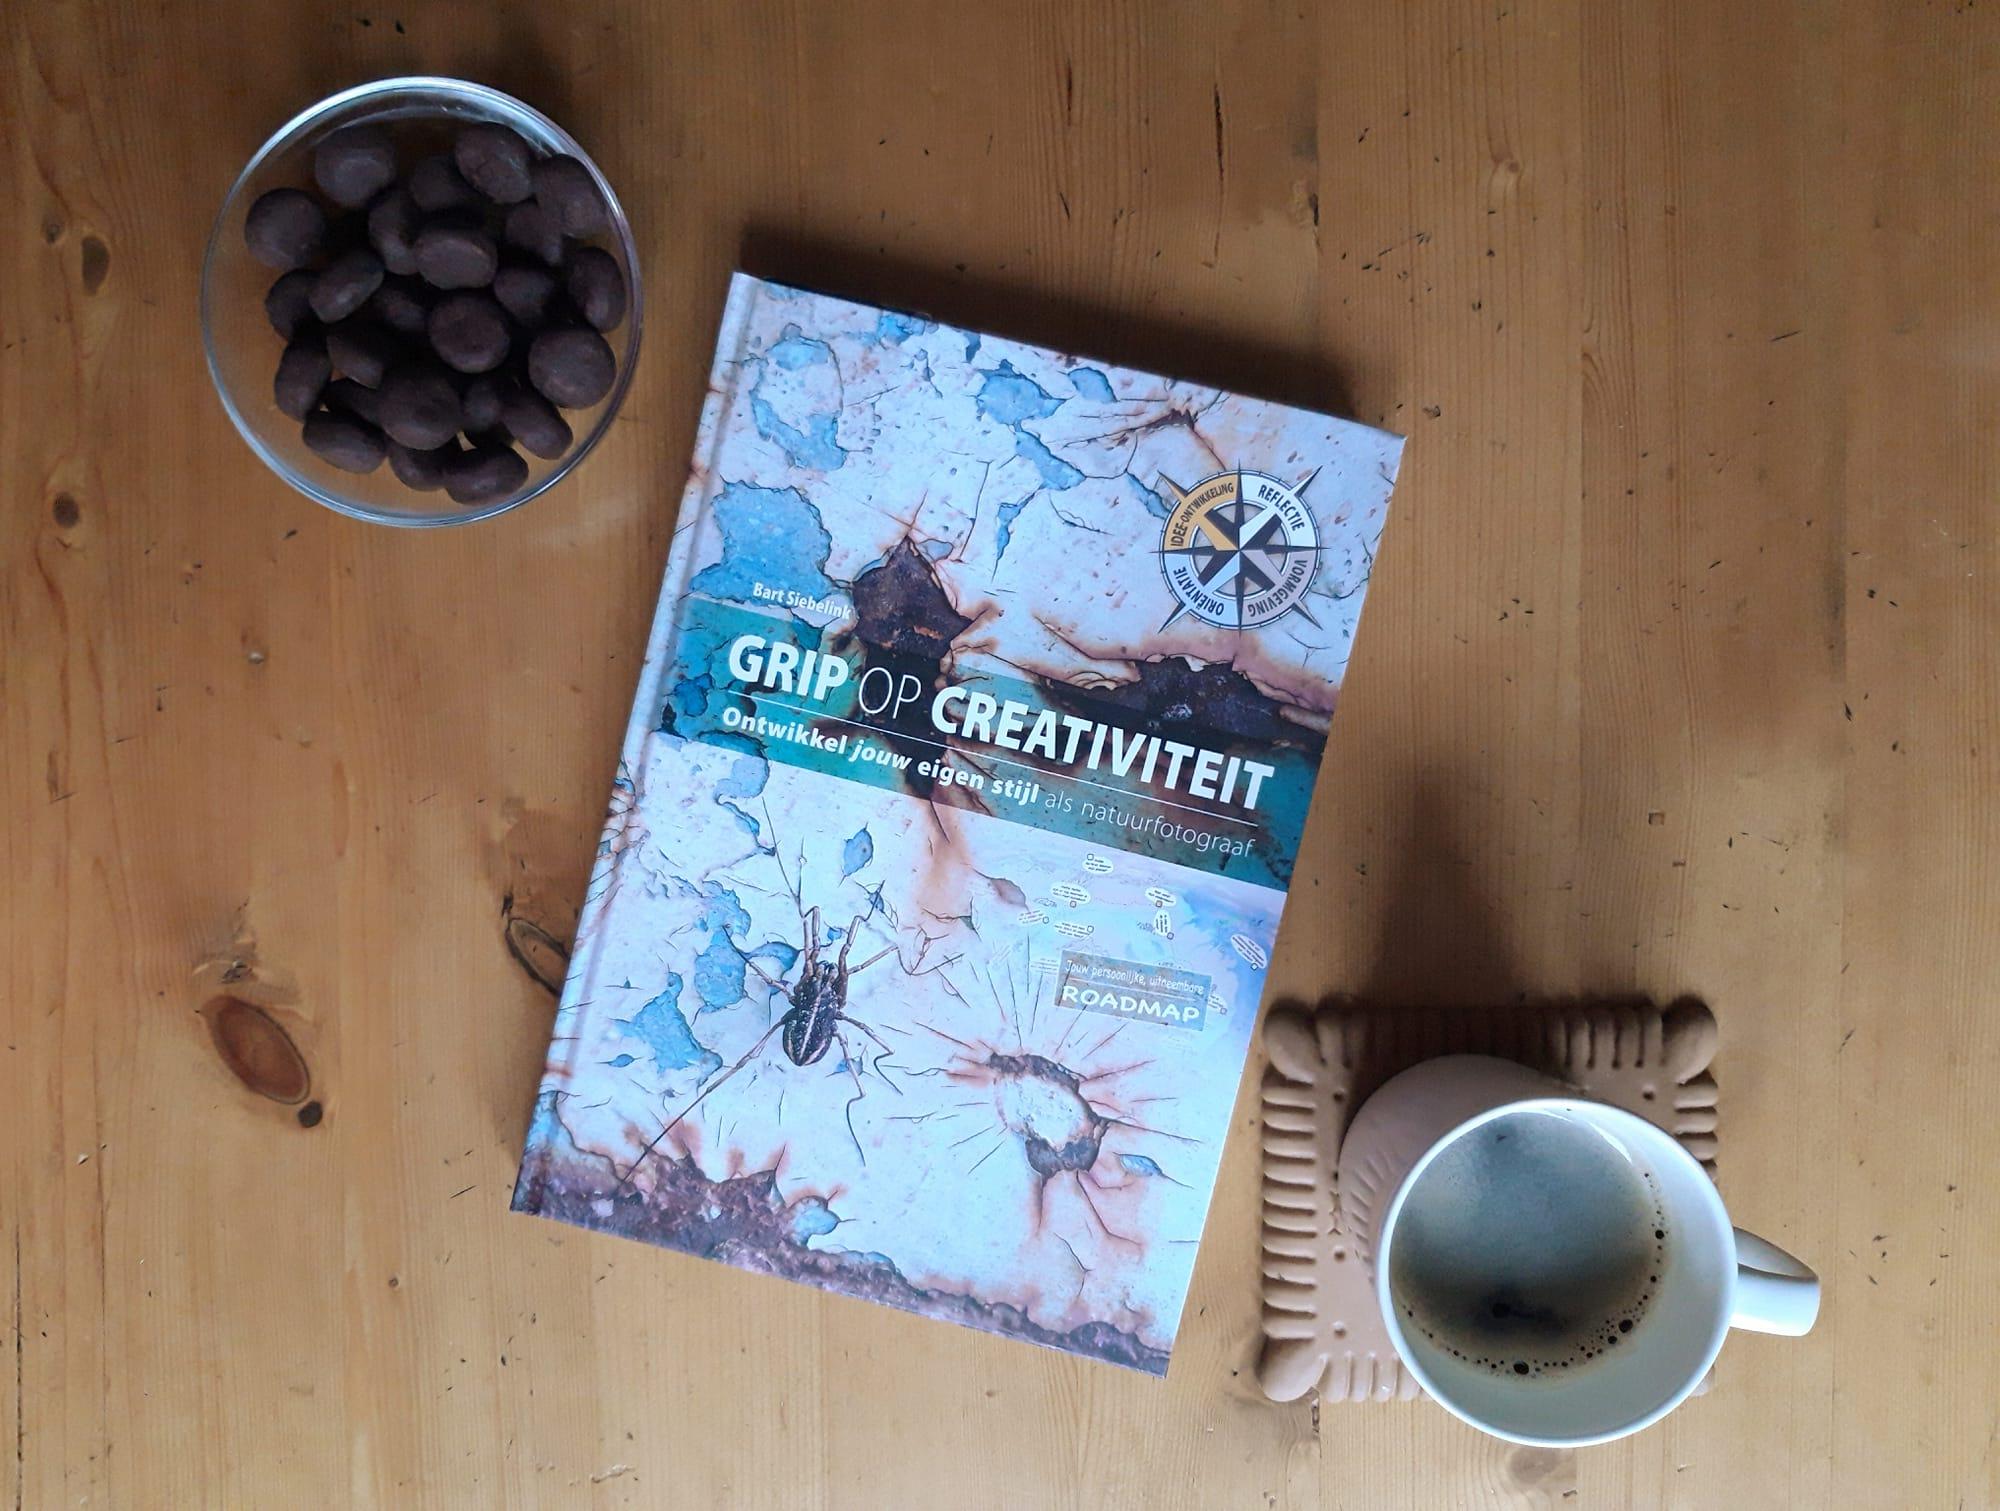 grip-op-creativiteit